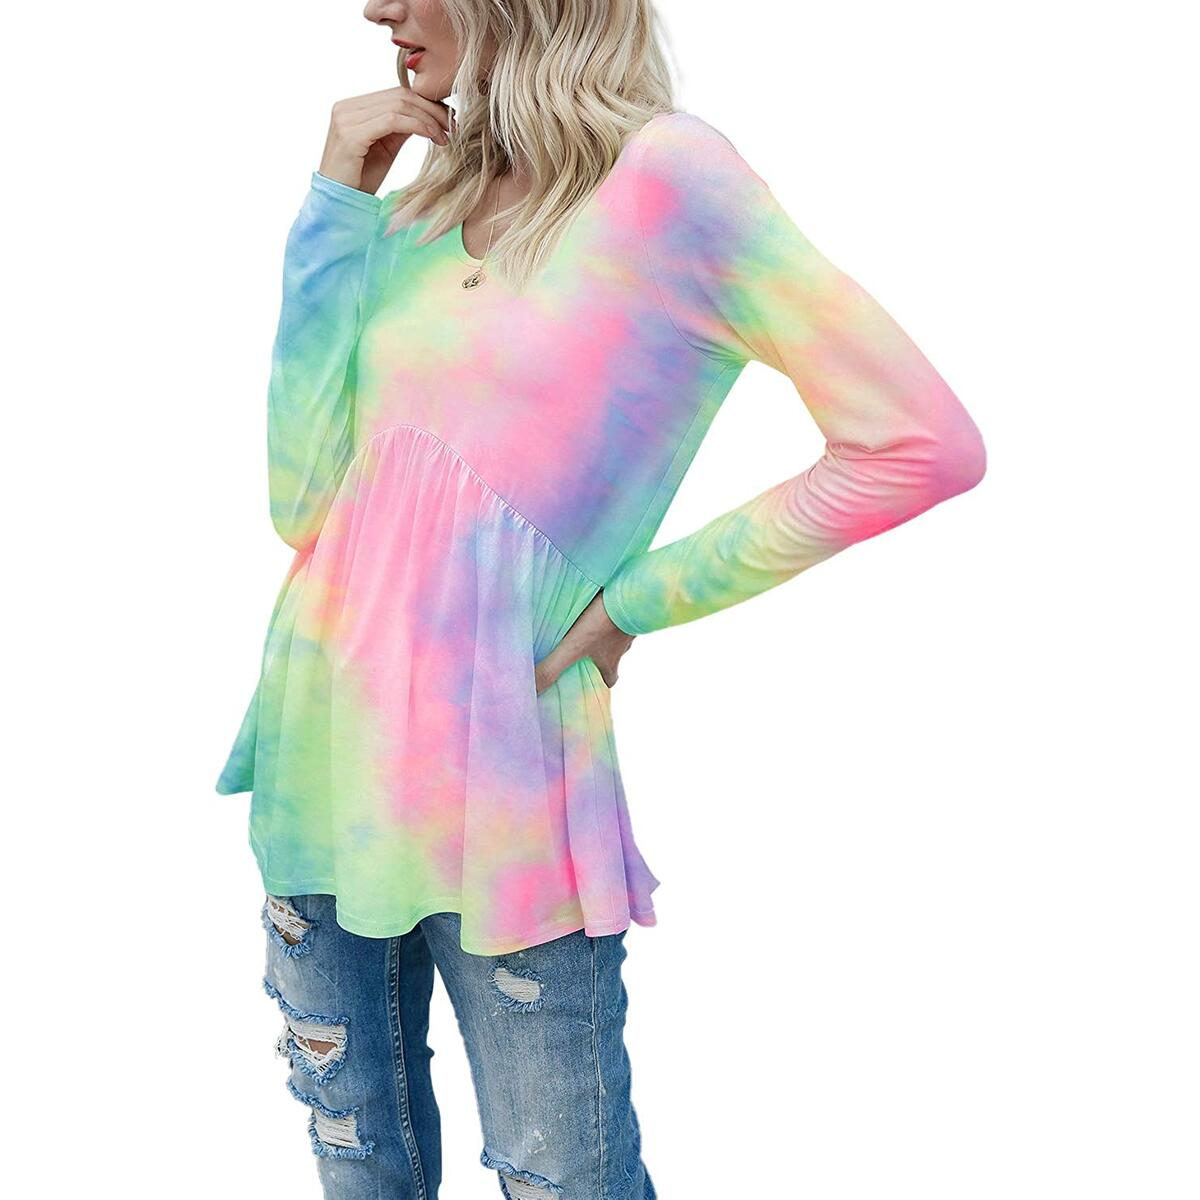 BASVO Davenil Women's Tie Dye Peplum Tops Long Sleeve Shirt Round Neck Loose Fitting Tunic Tops